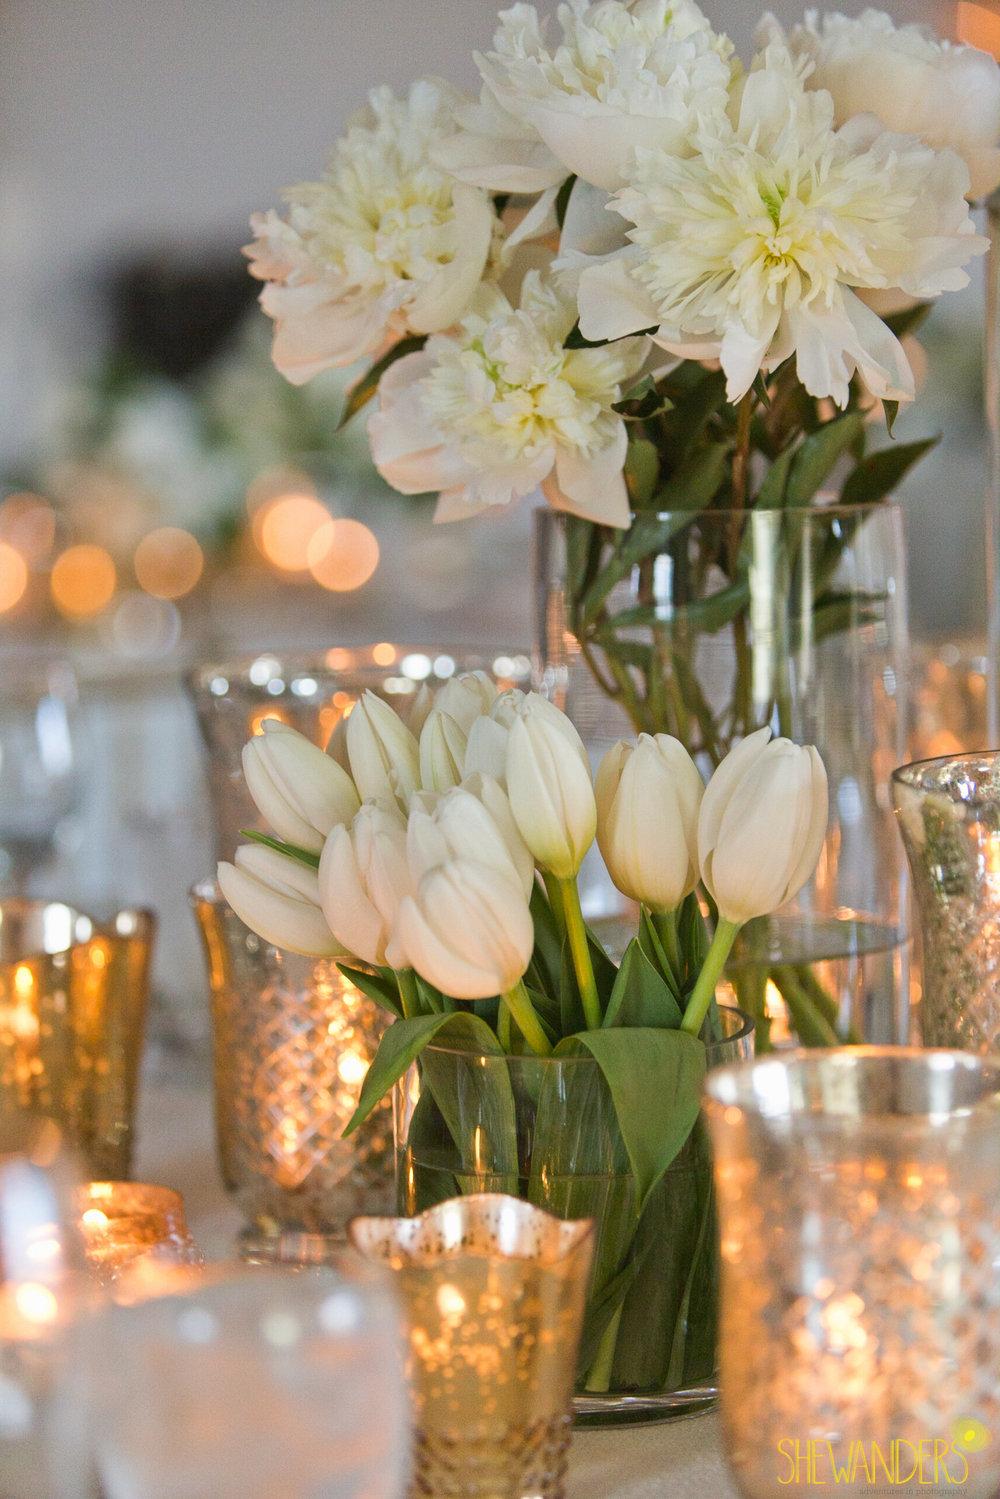 Shewanders.Coronado.Wedding.LaurenJessica-1034.jpg.Wedding.LaurenJessica-1034.jpg